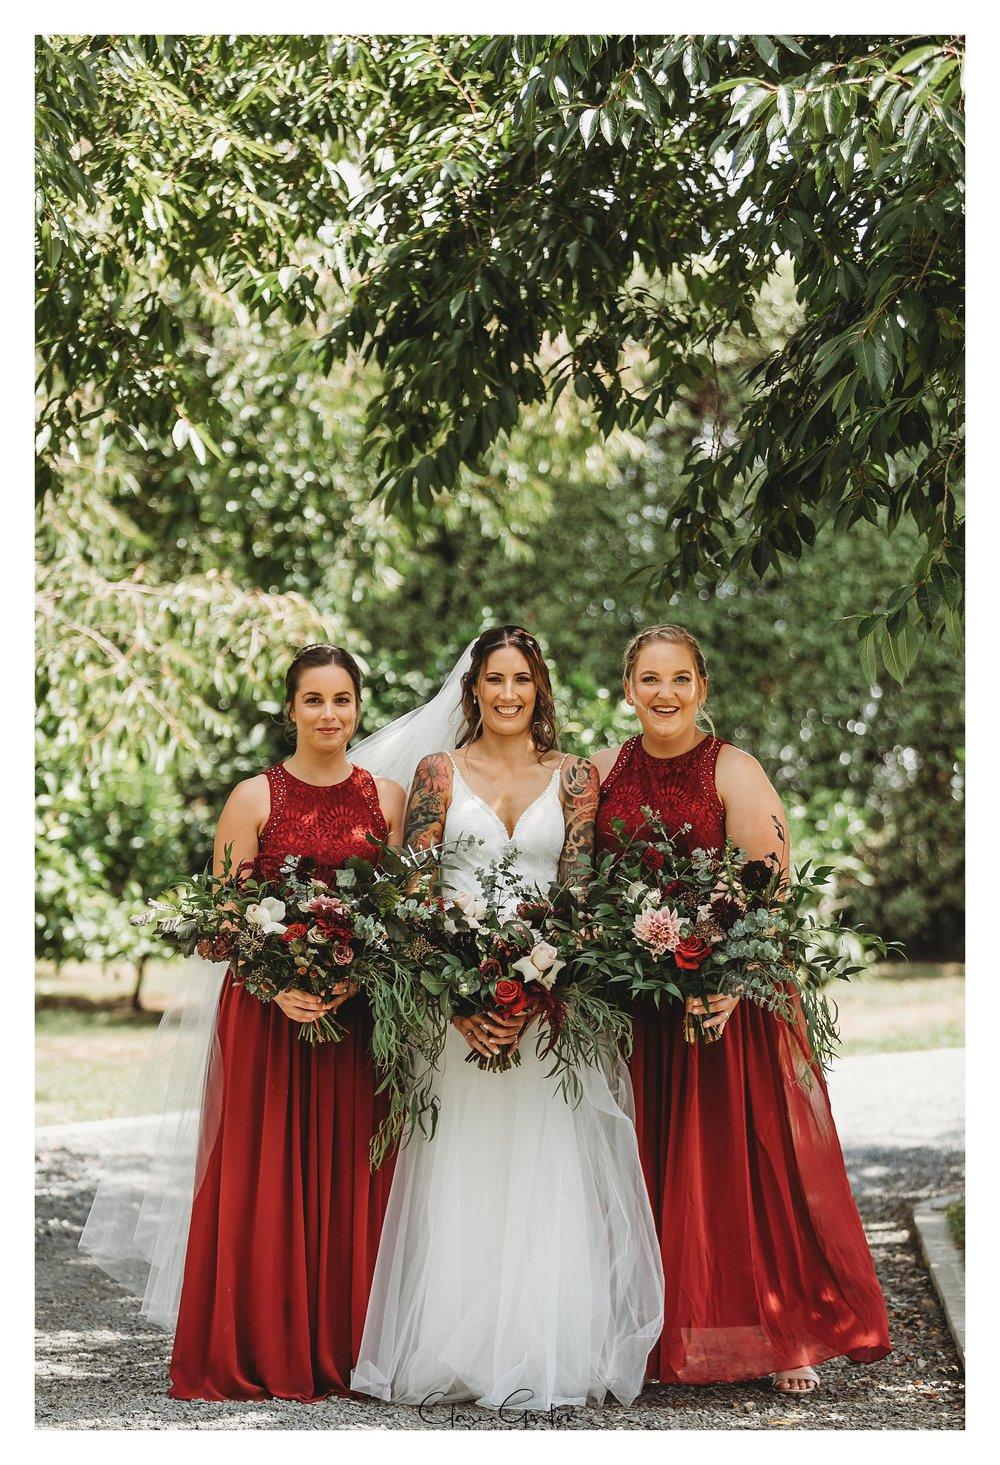 Waikato-wedding-photographer-Forest-weddnig-Hamilton-wedding-Newzealand (51).jpg